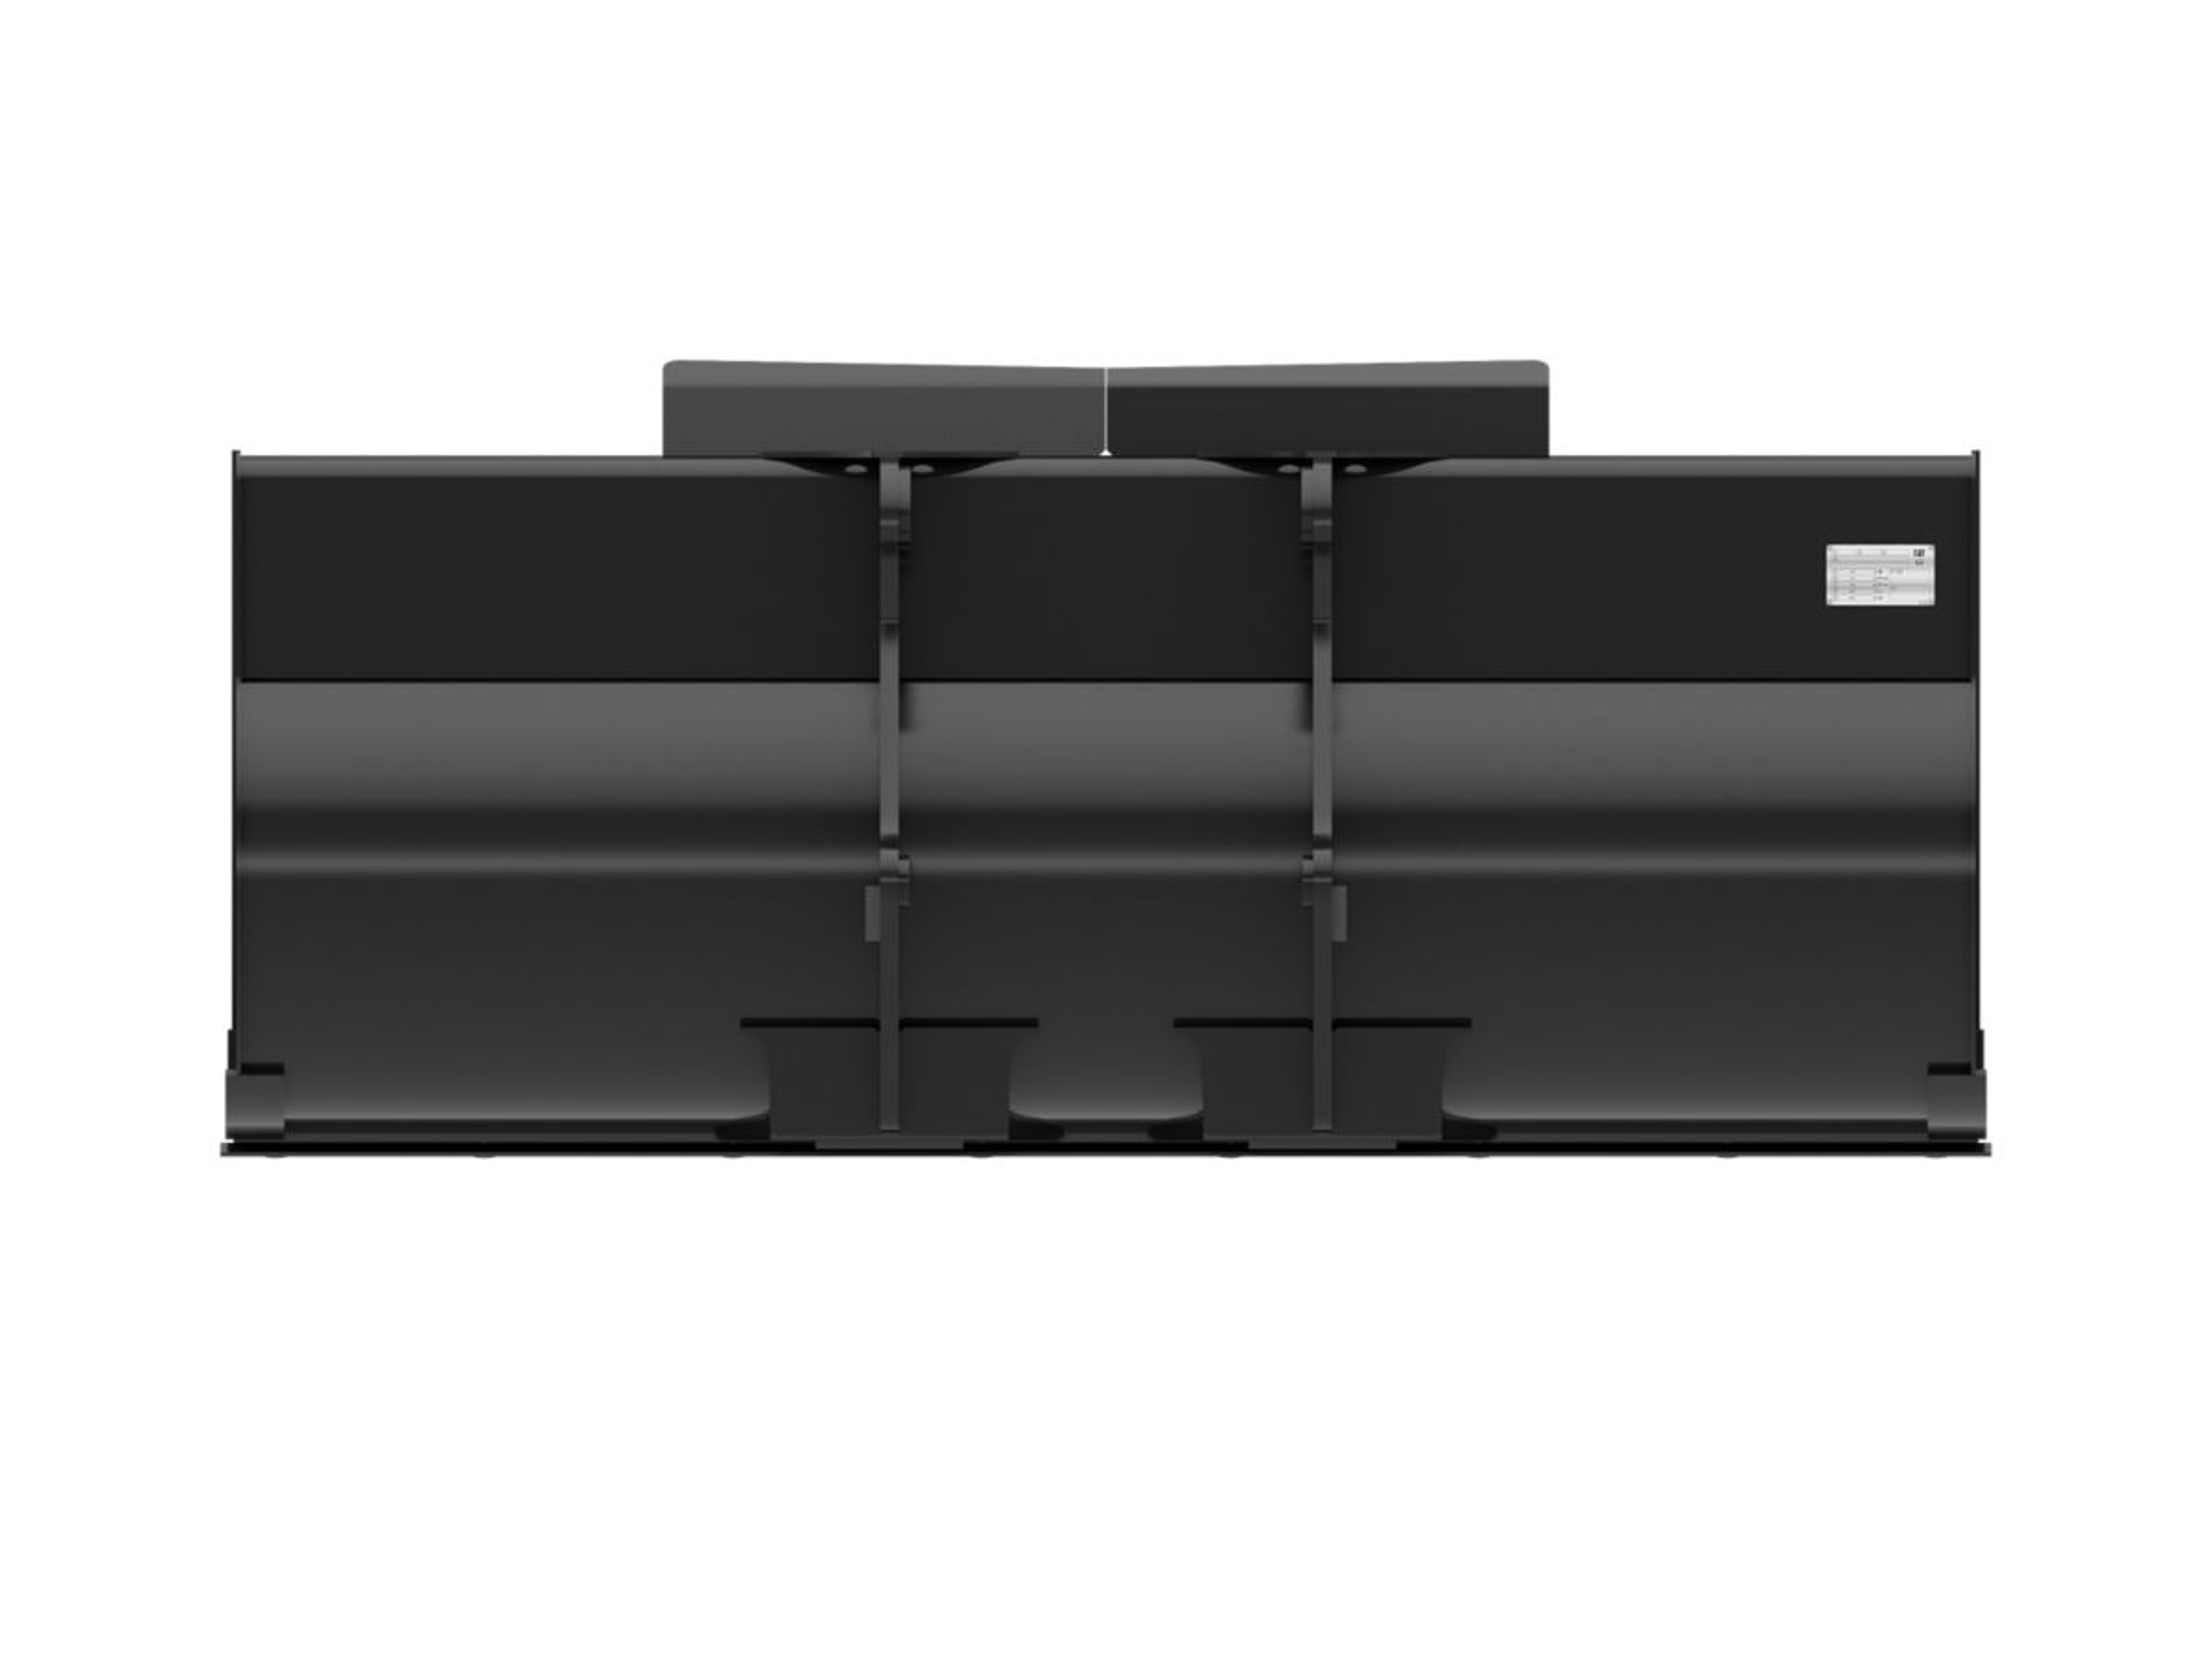 Gallery 1.3 m3 (1.7 yd3), IT Coupler, Bolt-On Cutting Edge